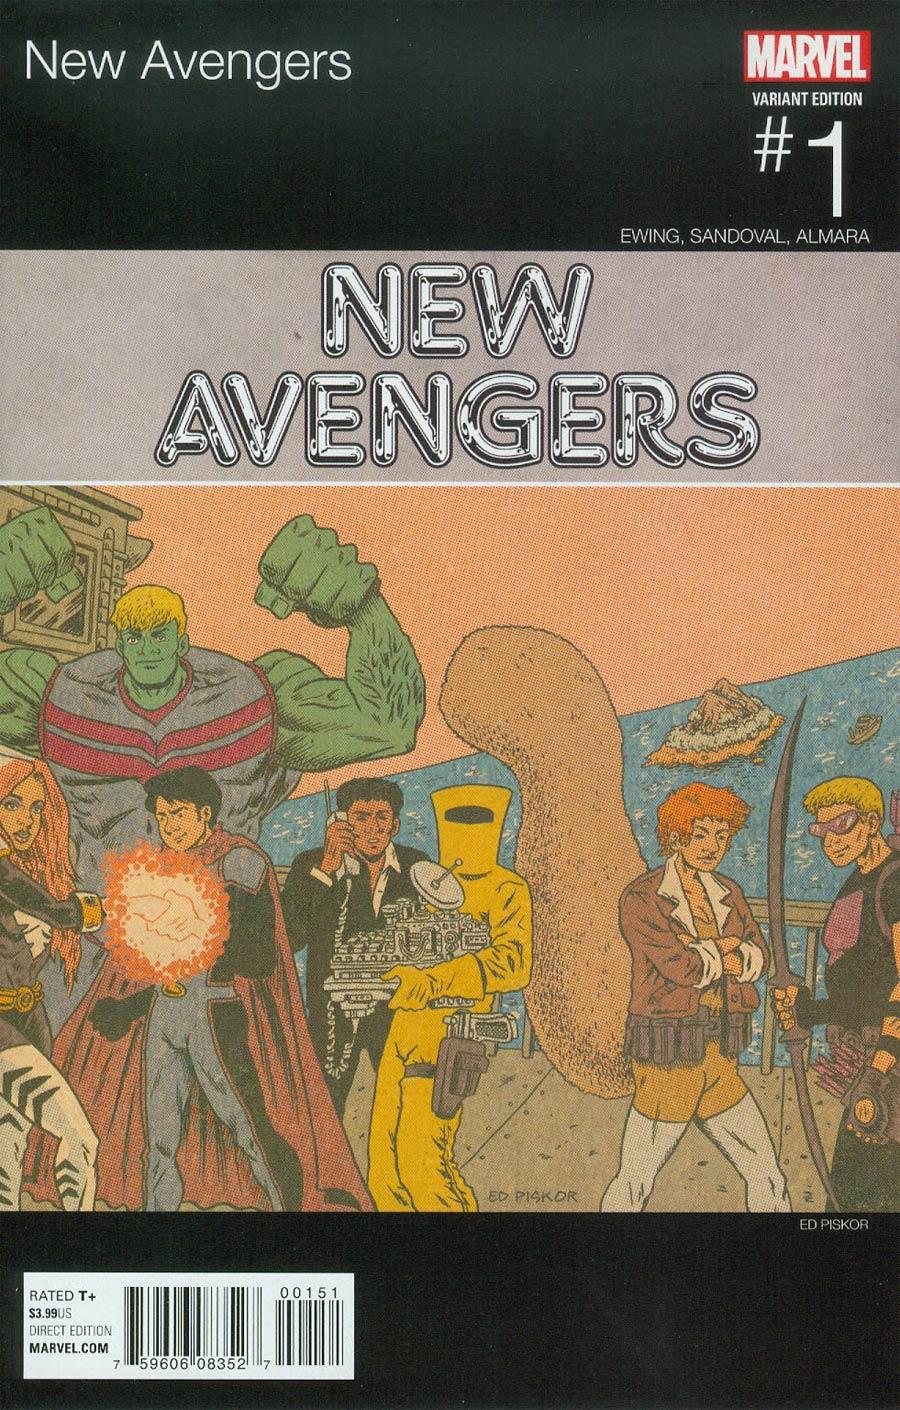 New Avengers Vol 4 #1 Cover B Variant Marvel Hip-Hop Cover